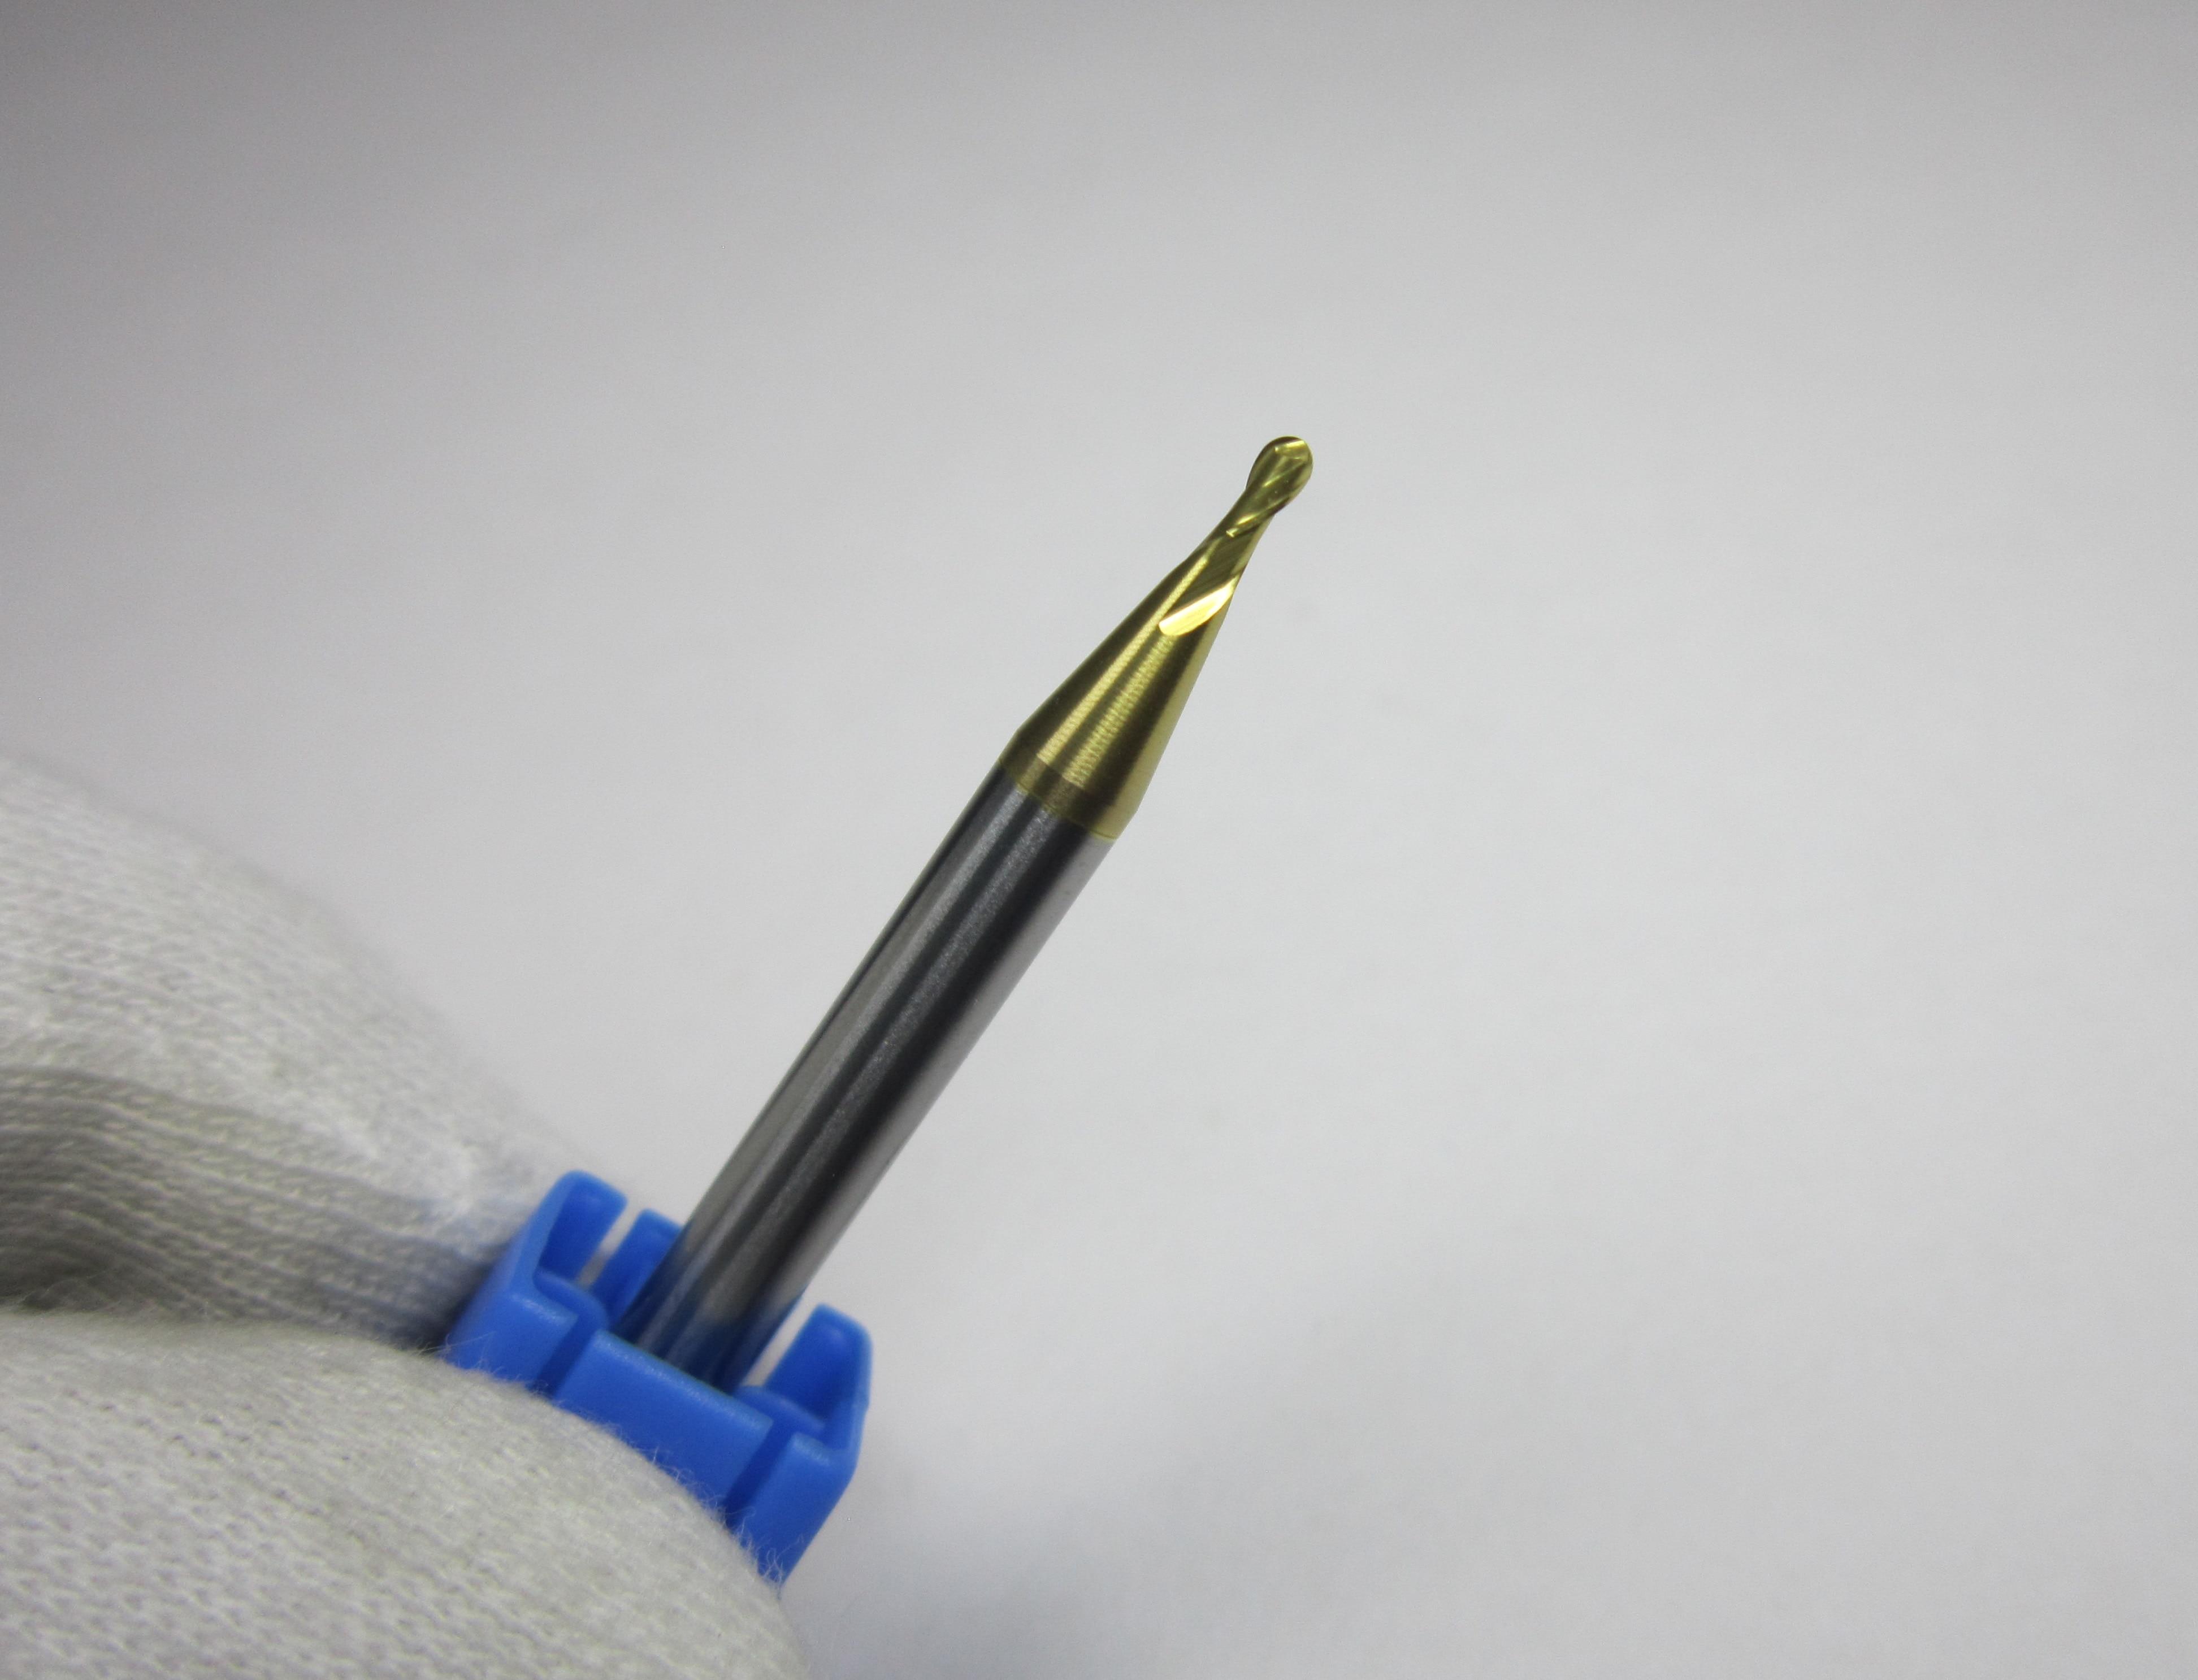 Ø 4mm R2.0 HRC58 Carbide Ball Nose End Mills milling cutter finishing metalwork